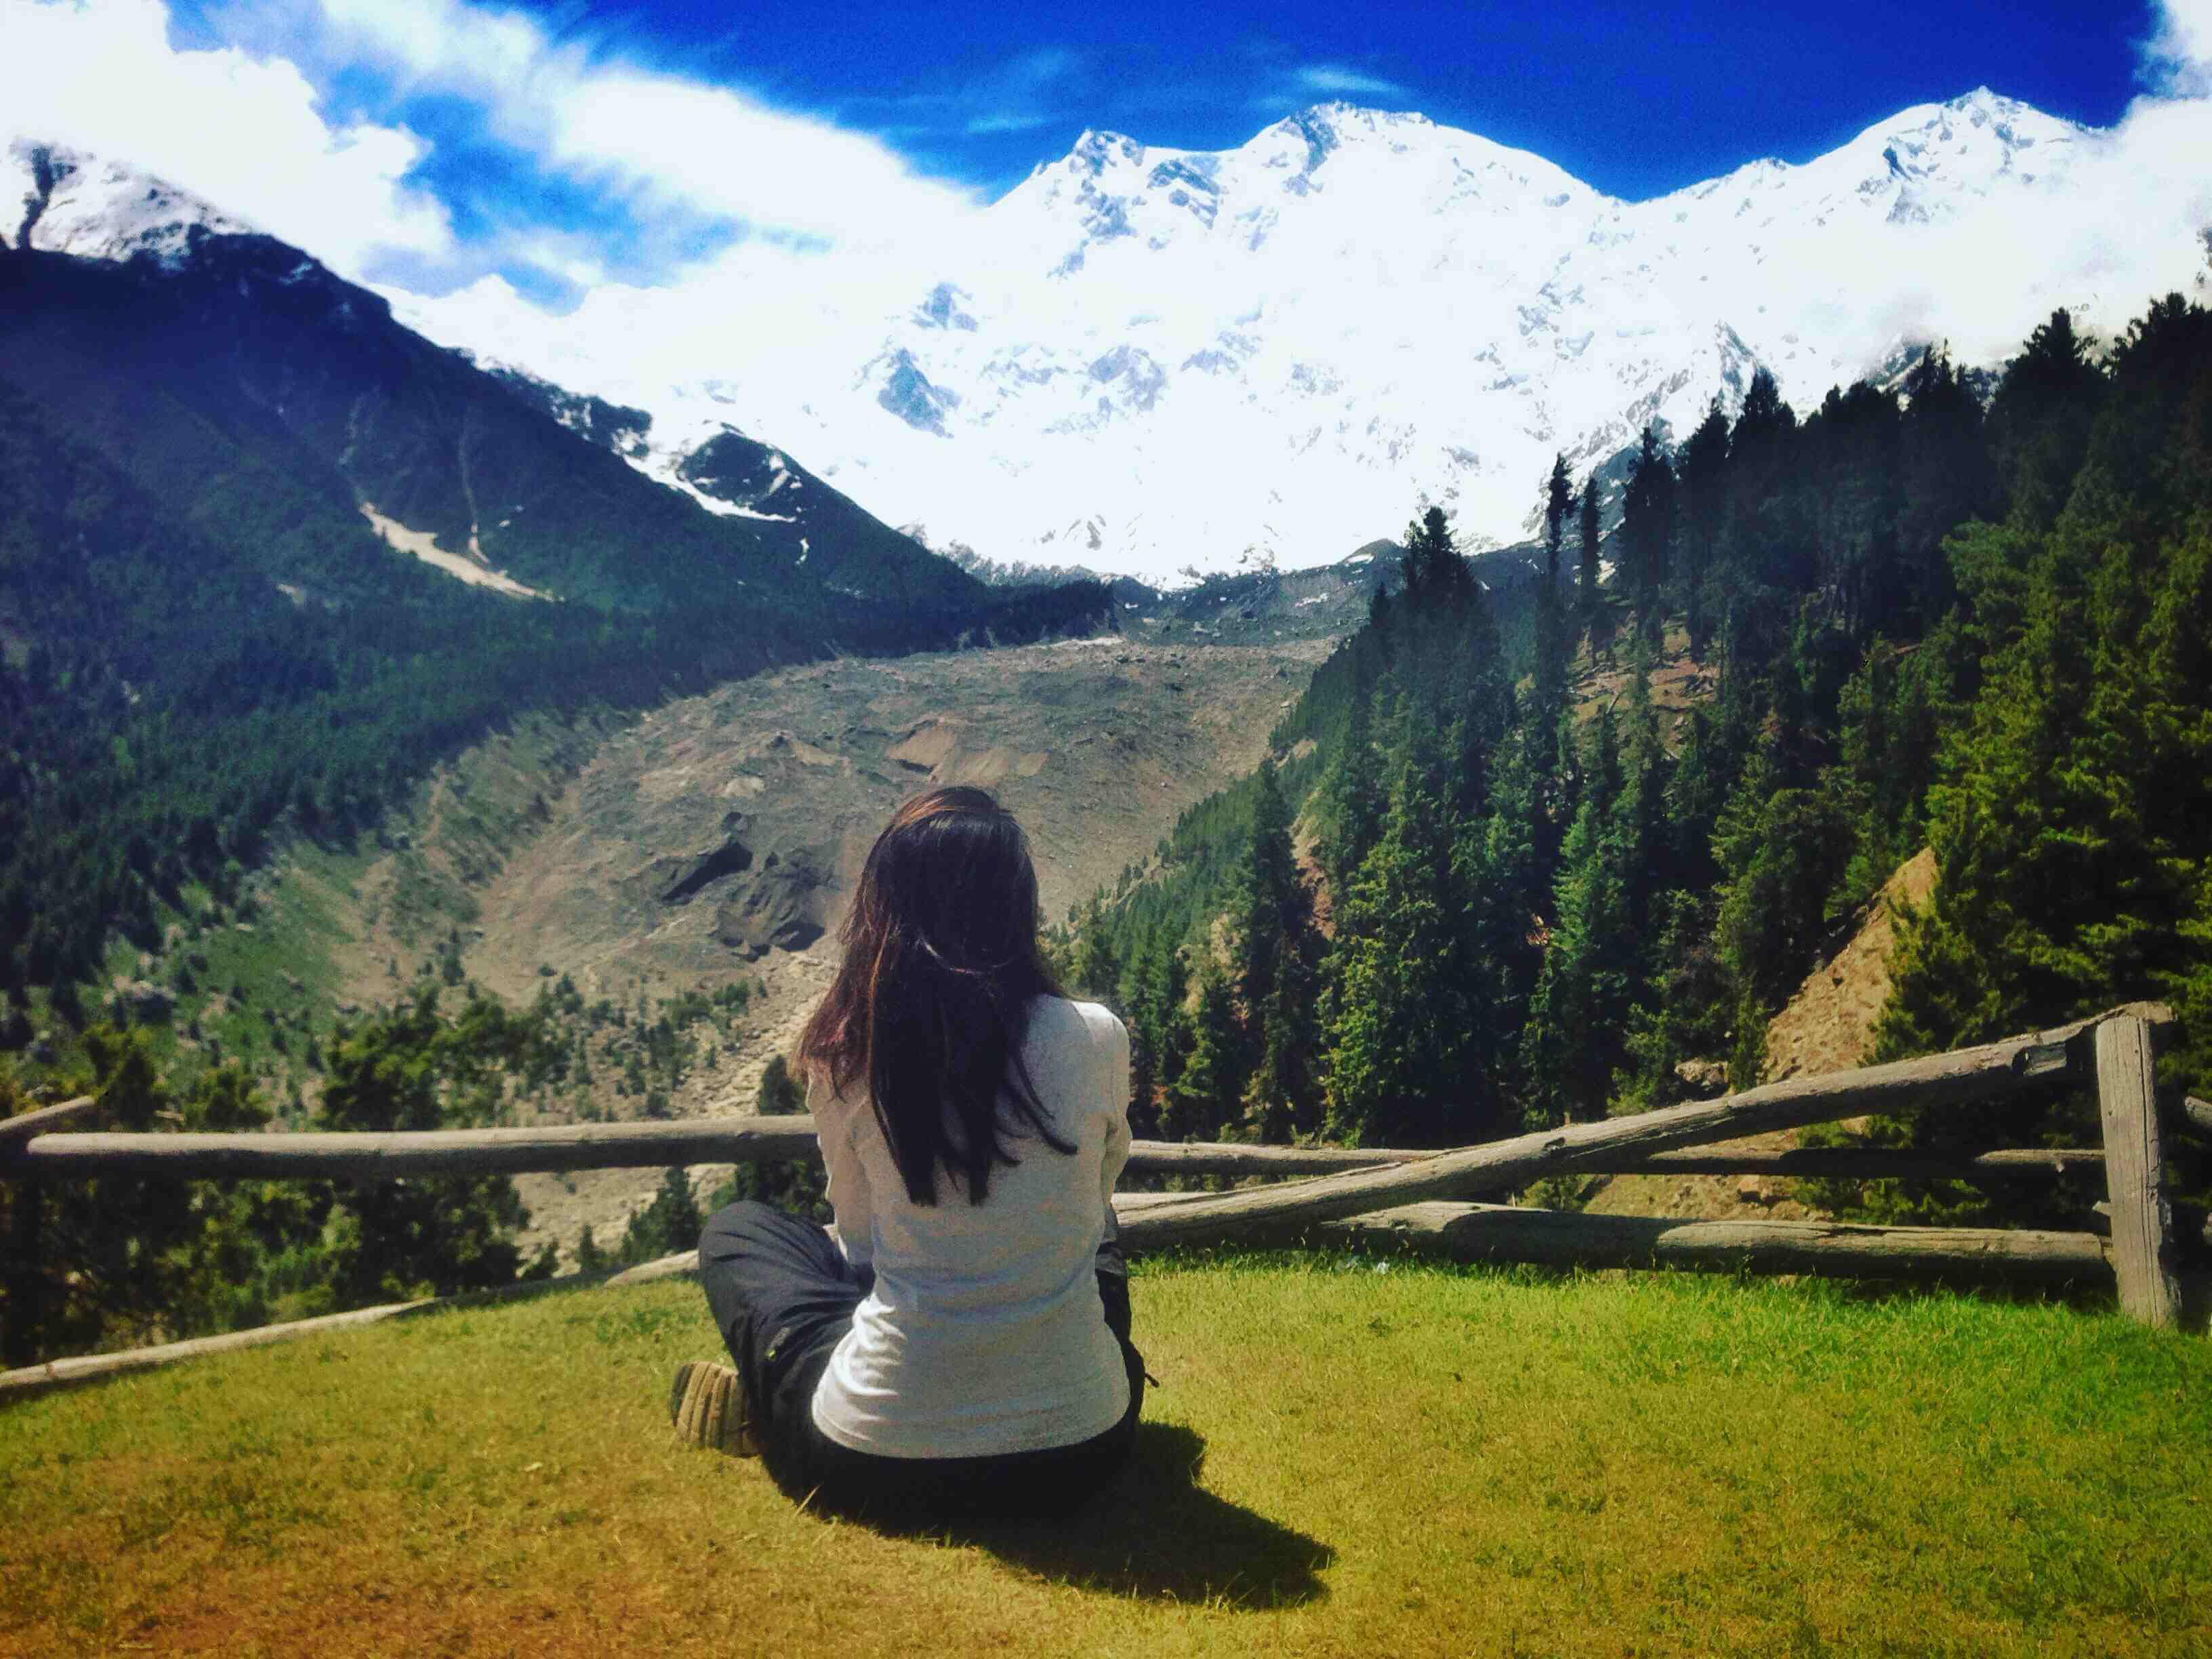 05 Days Tour to Fairy Meadows & Nanga Parbat Base Camp Holiday Travel & Tour Package